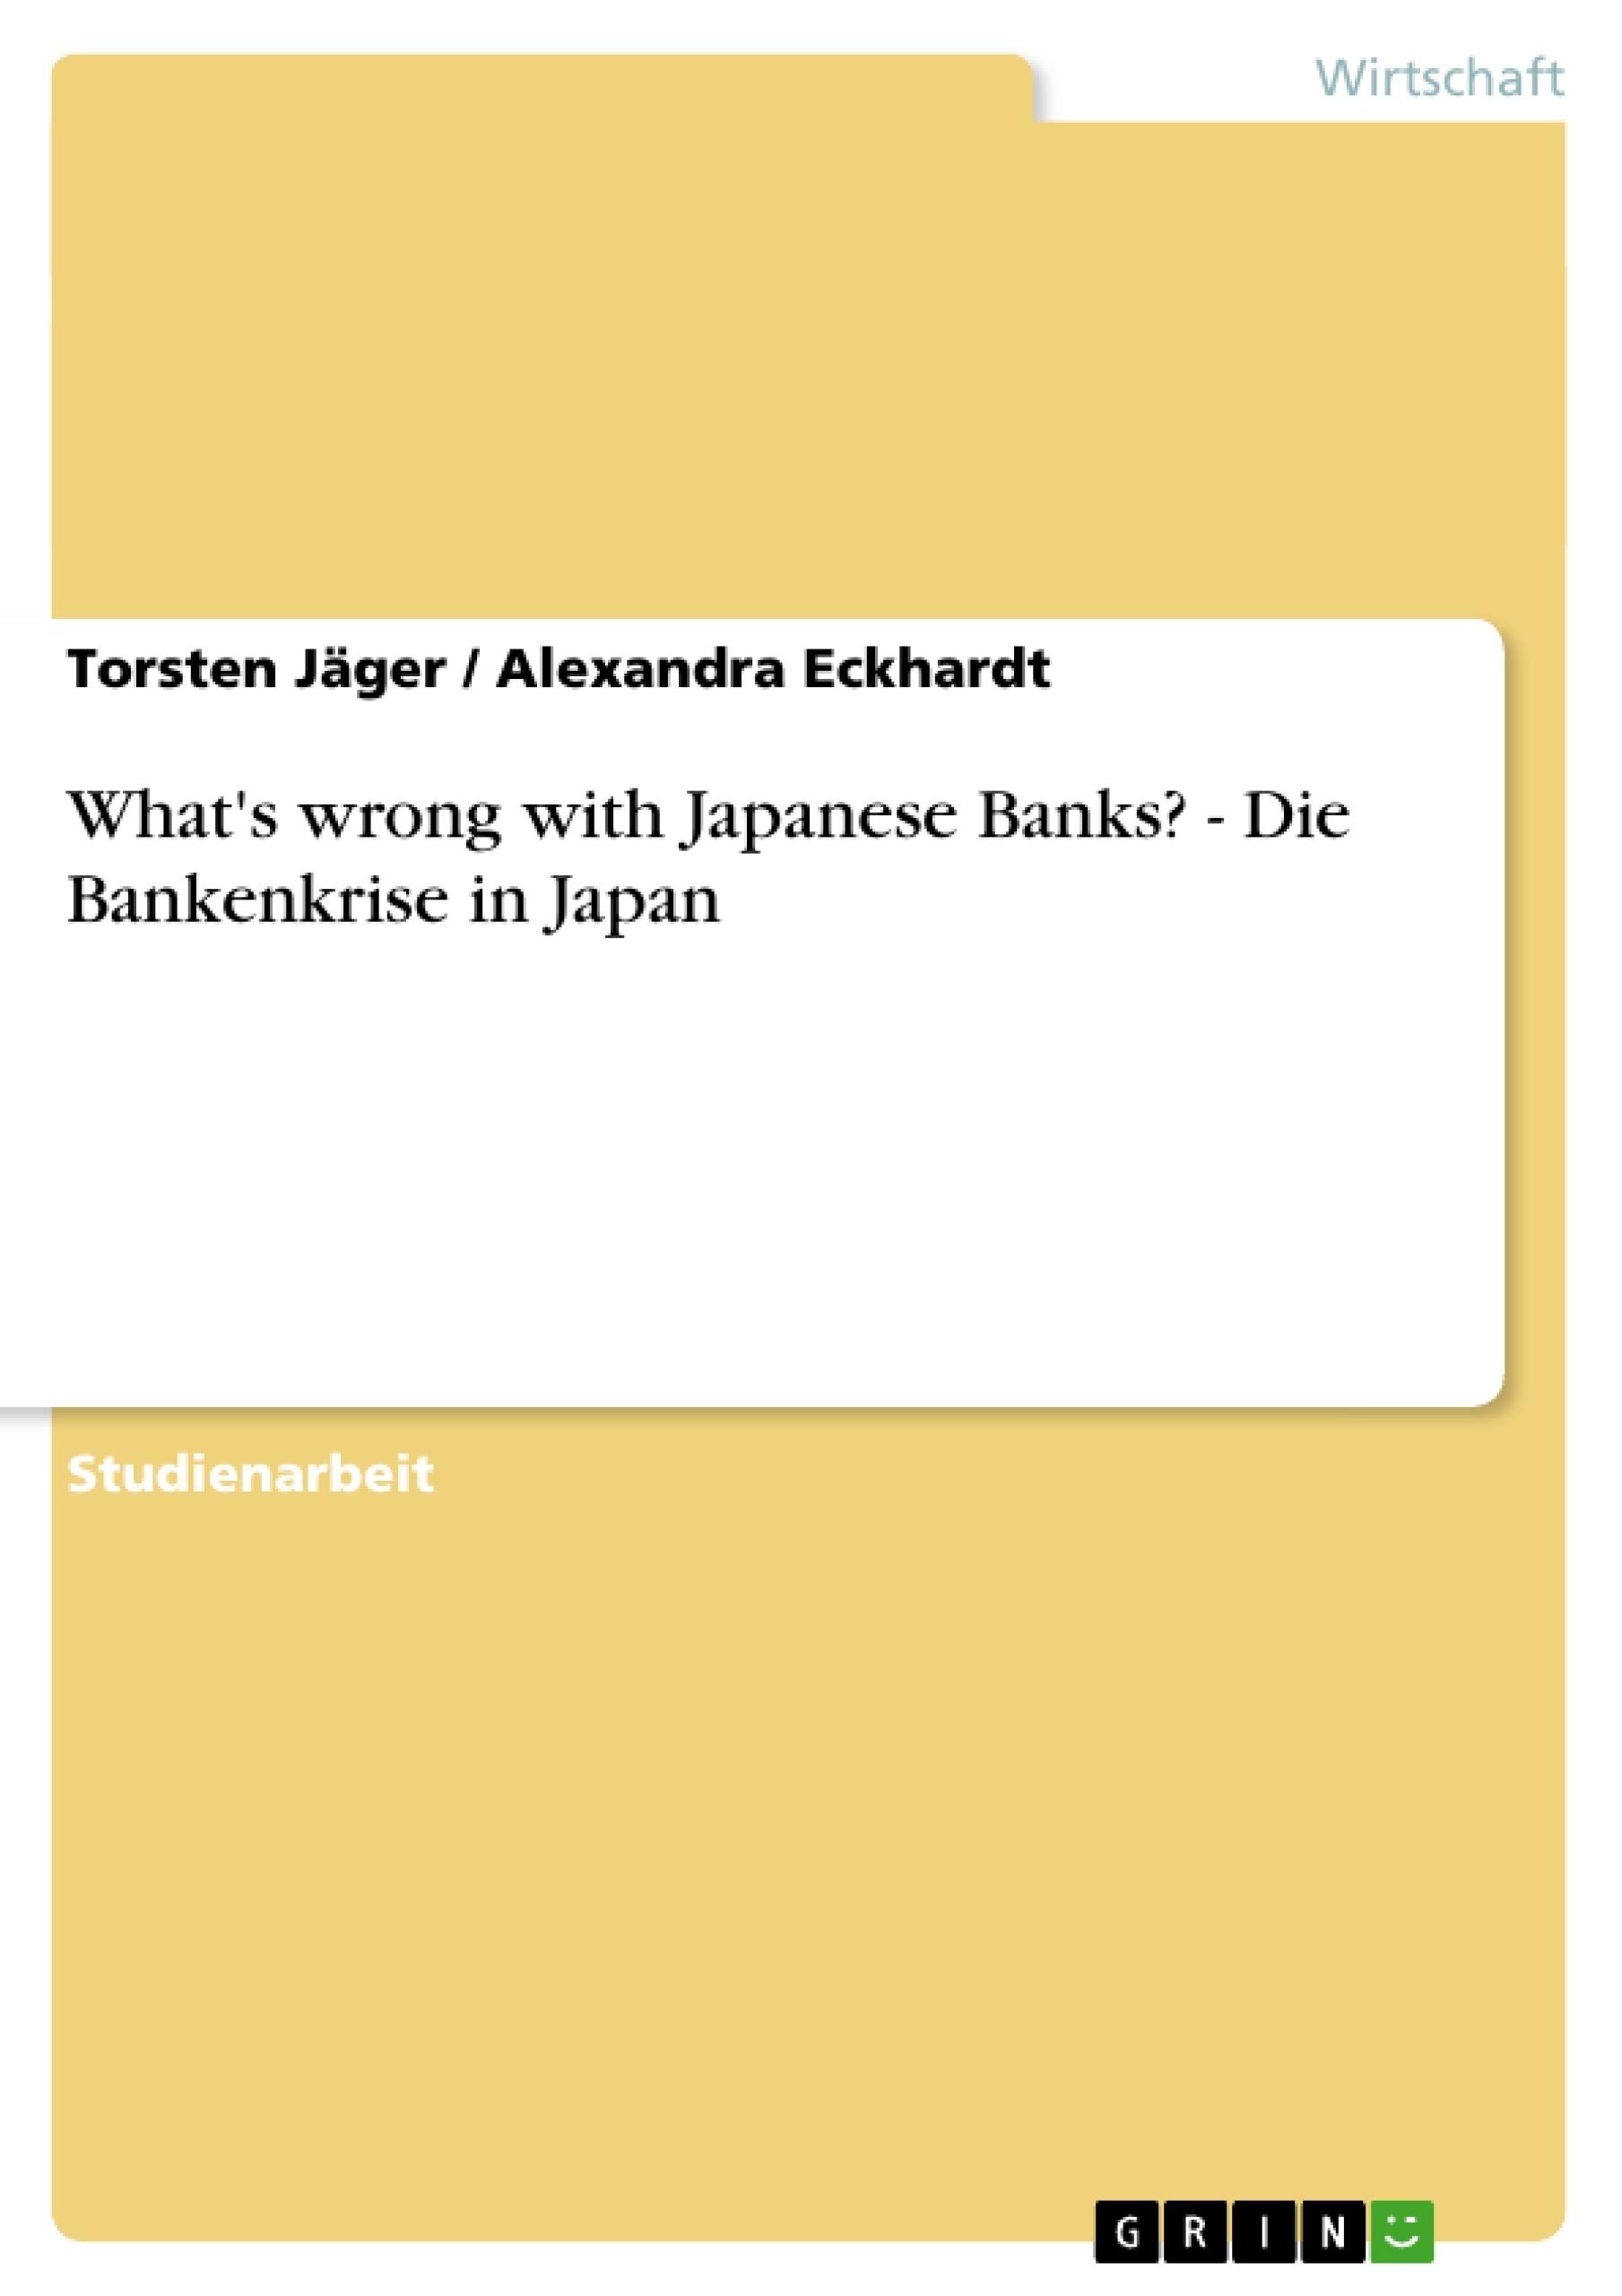 Titel: What's wrong with Japanese Banks? - Die Bankenkrise in Japan